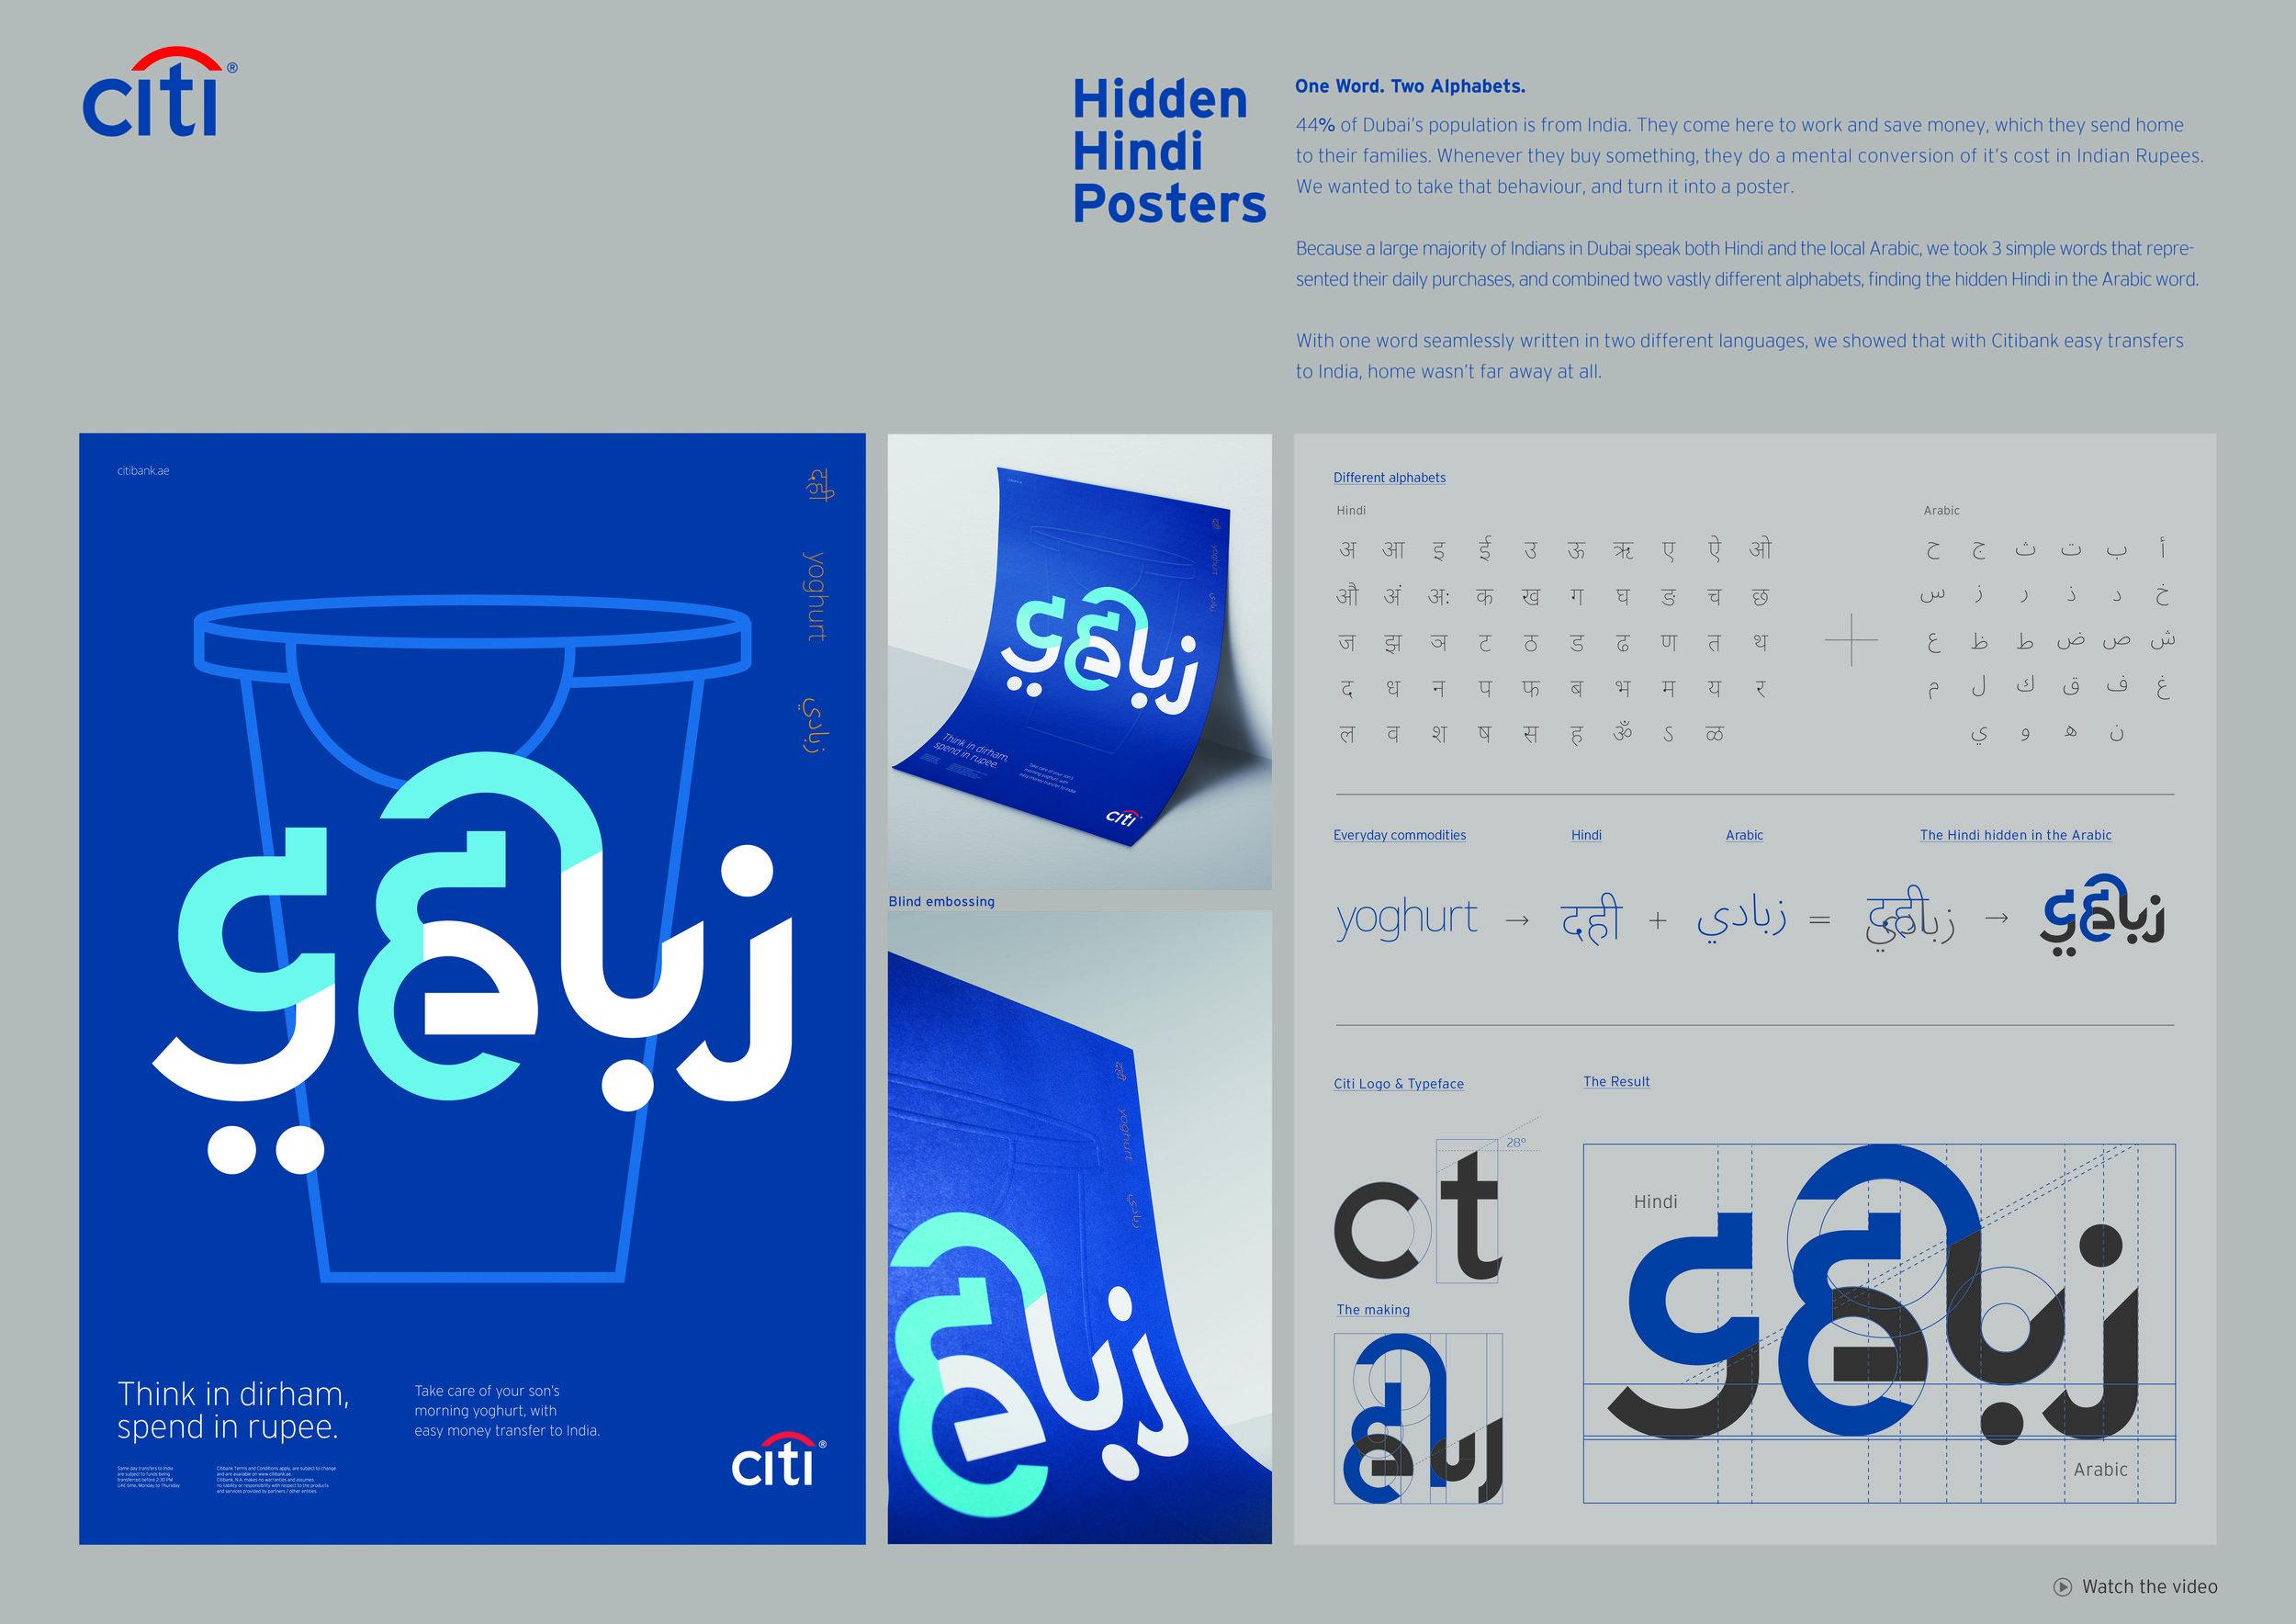 CITI_Hidden Hindi_Board_Craft Typography.jpg